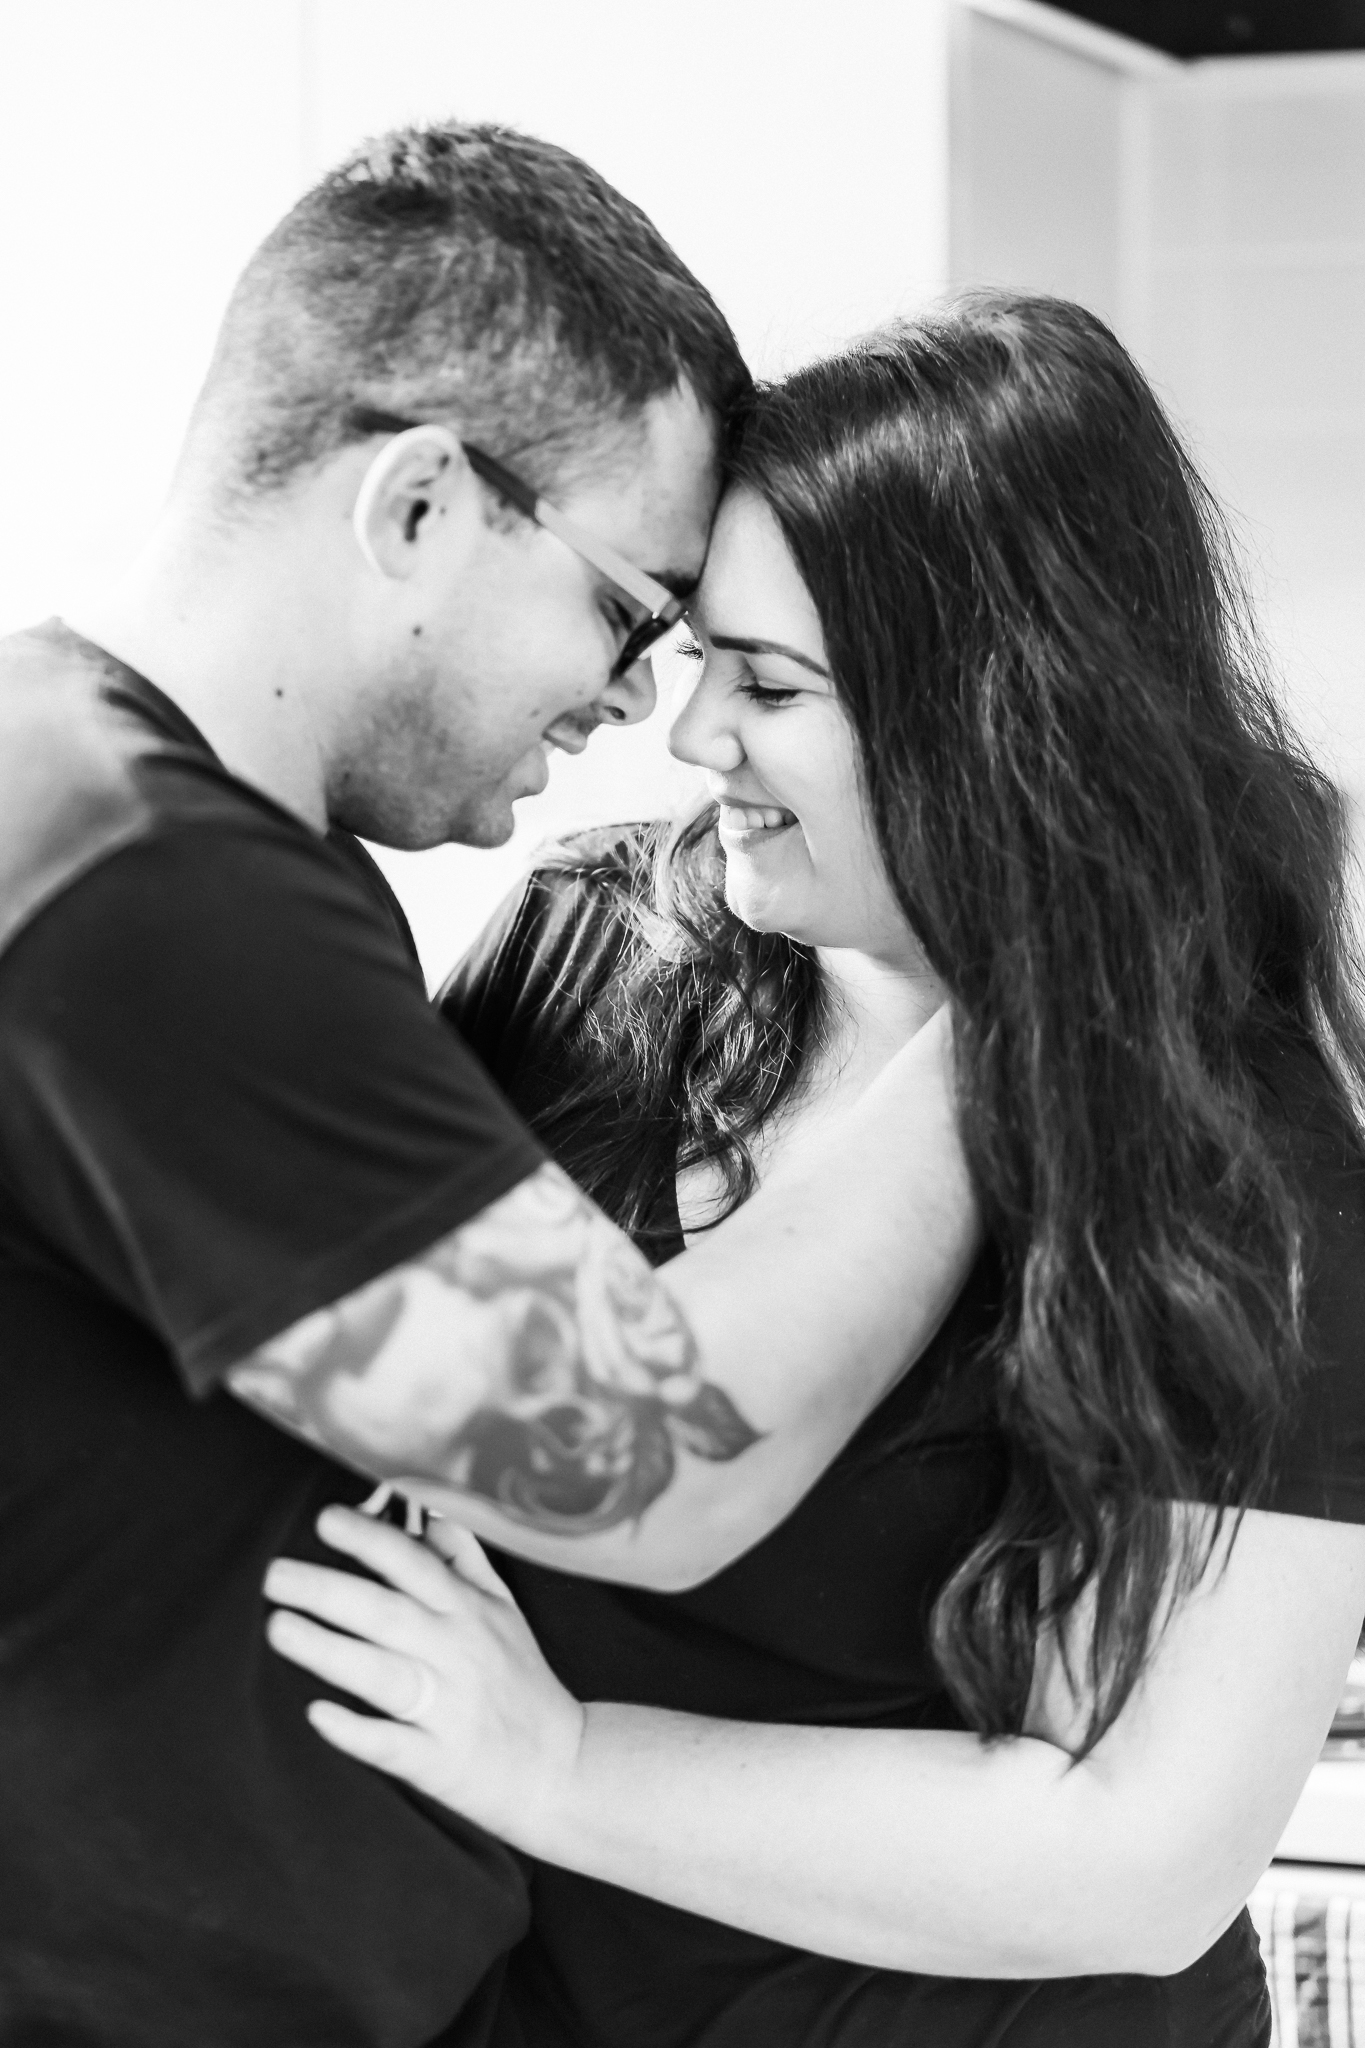 Geringer Couples Lifestyle-124-Edit-2.jpg